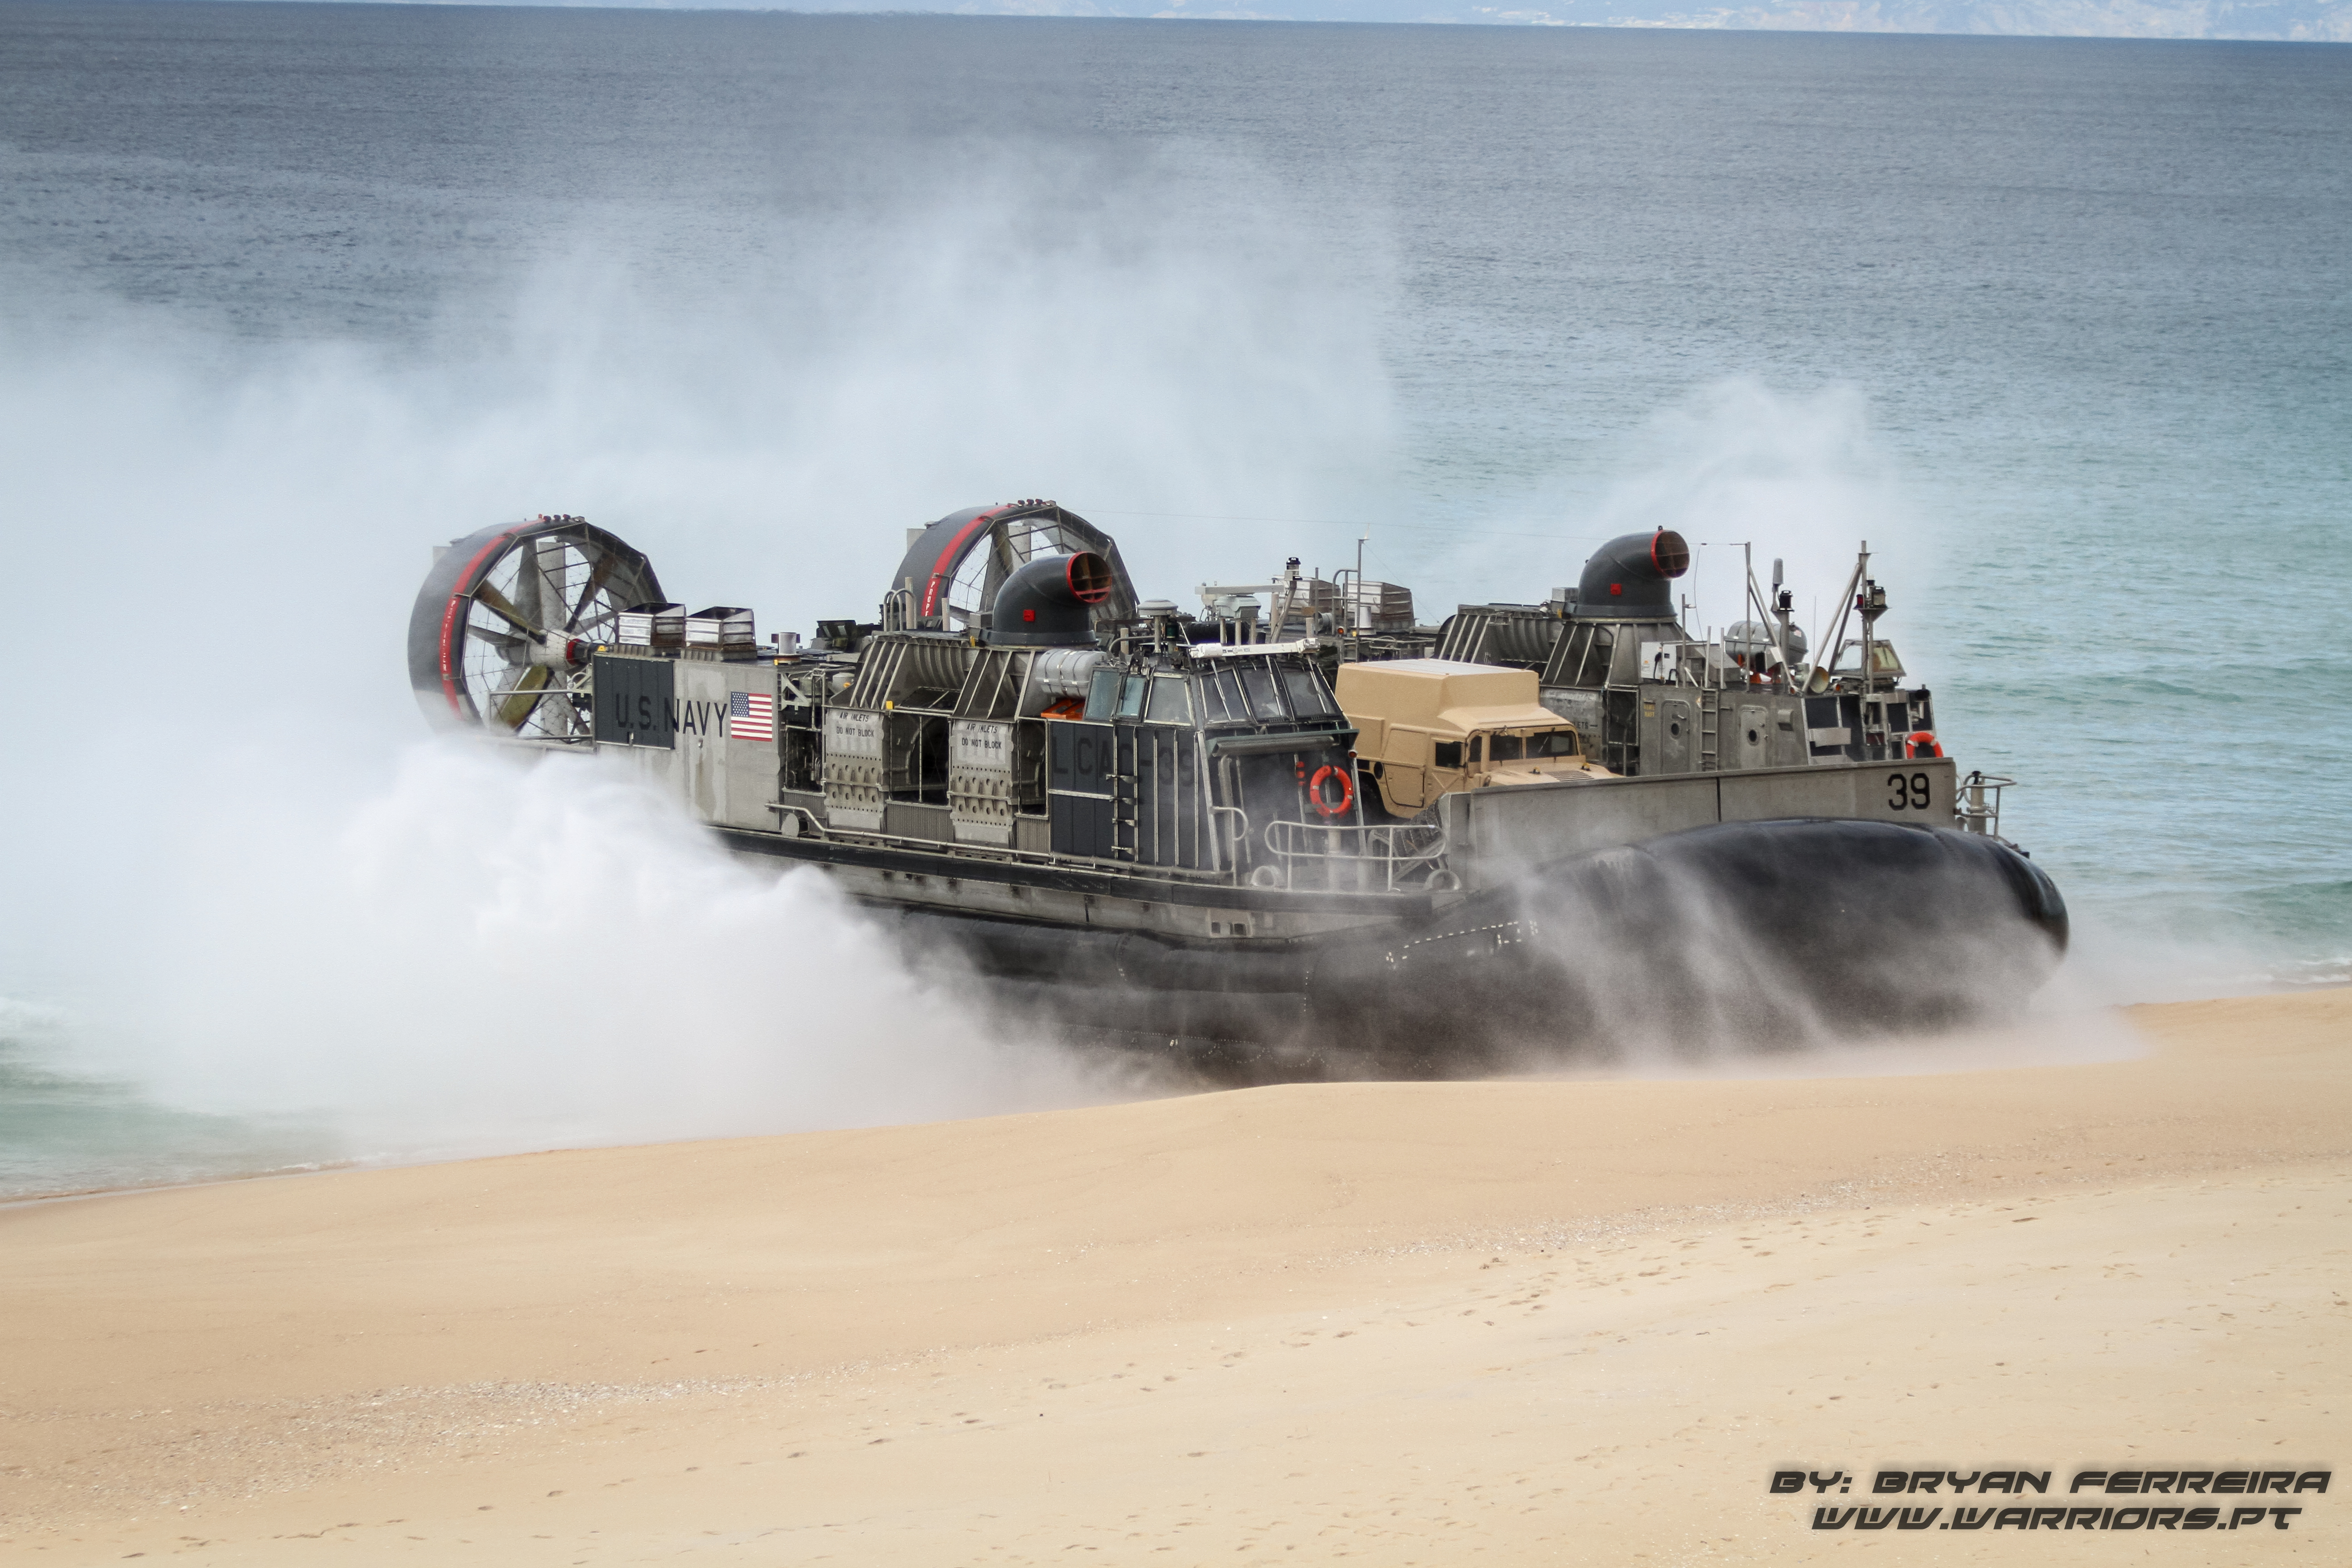 LCAC da US Navy acosta à praia de modo a desembarcar HMMWV e LAV25 dos US MArines na praia